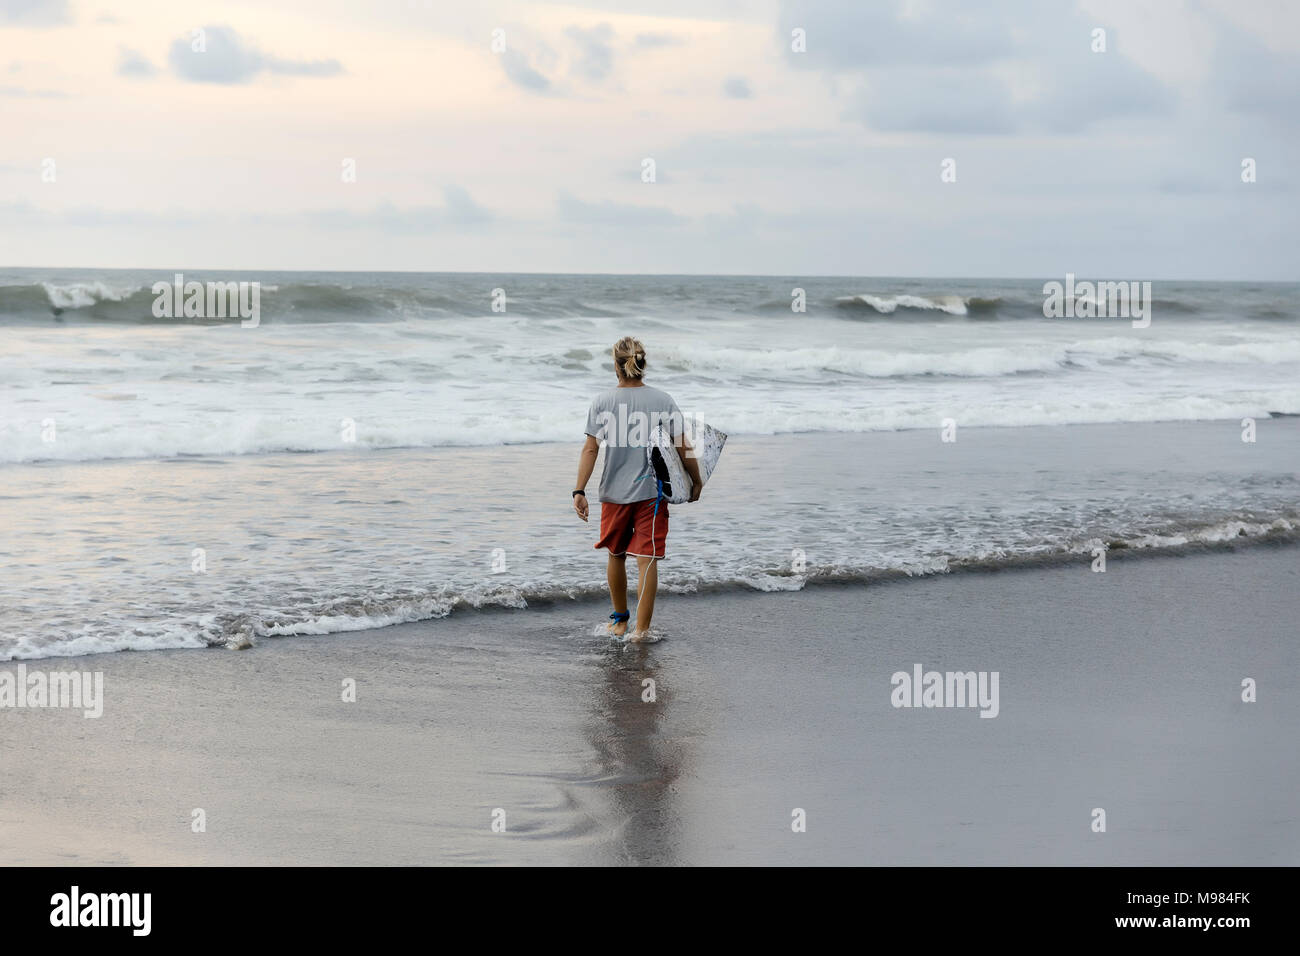 Indonesia, Bali, surfer caminar en el agua Foto de stock